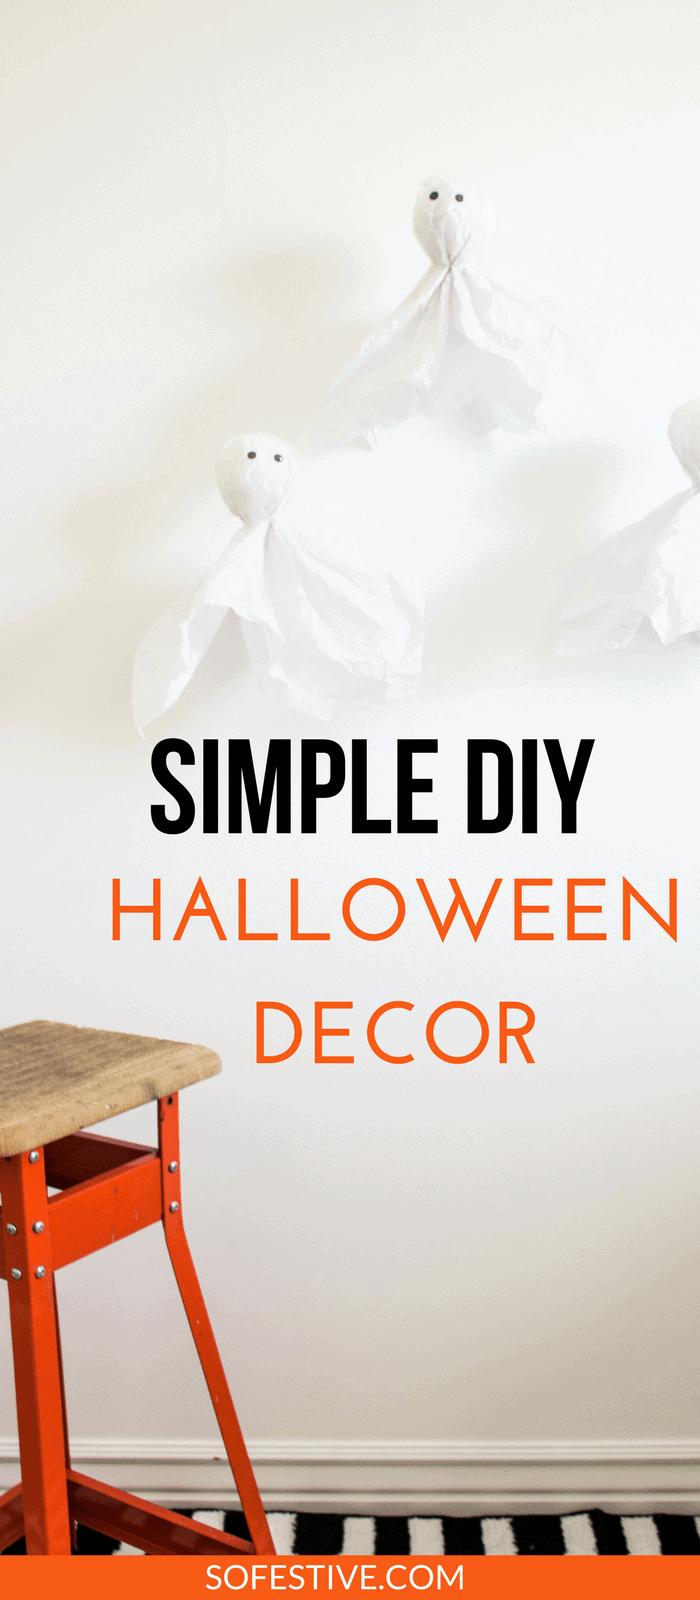 simple diy halloween decorations halloween party ideas cheap halloween decor ideas